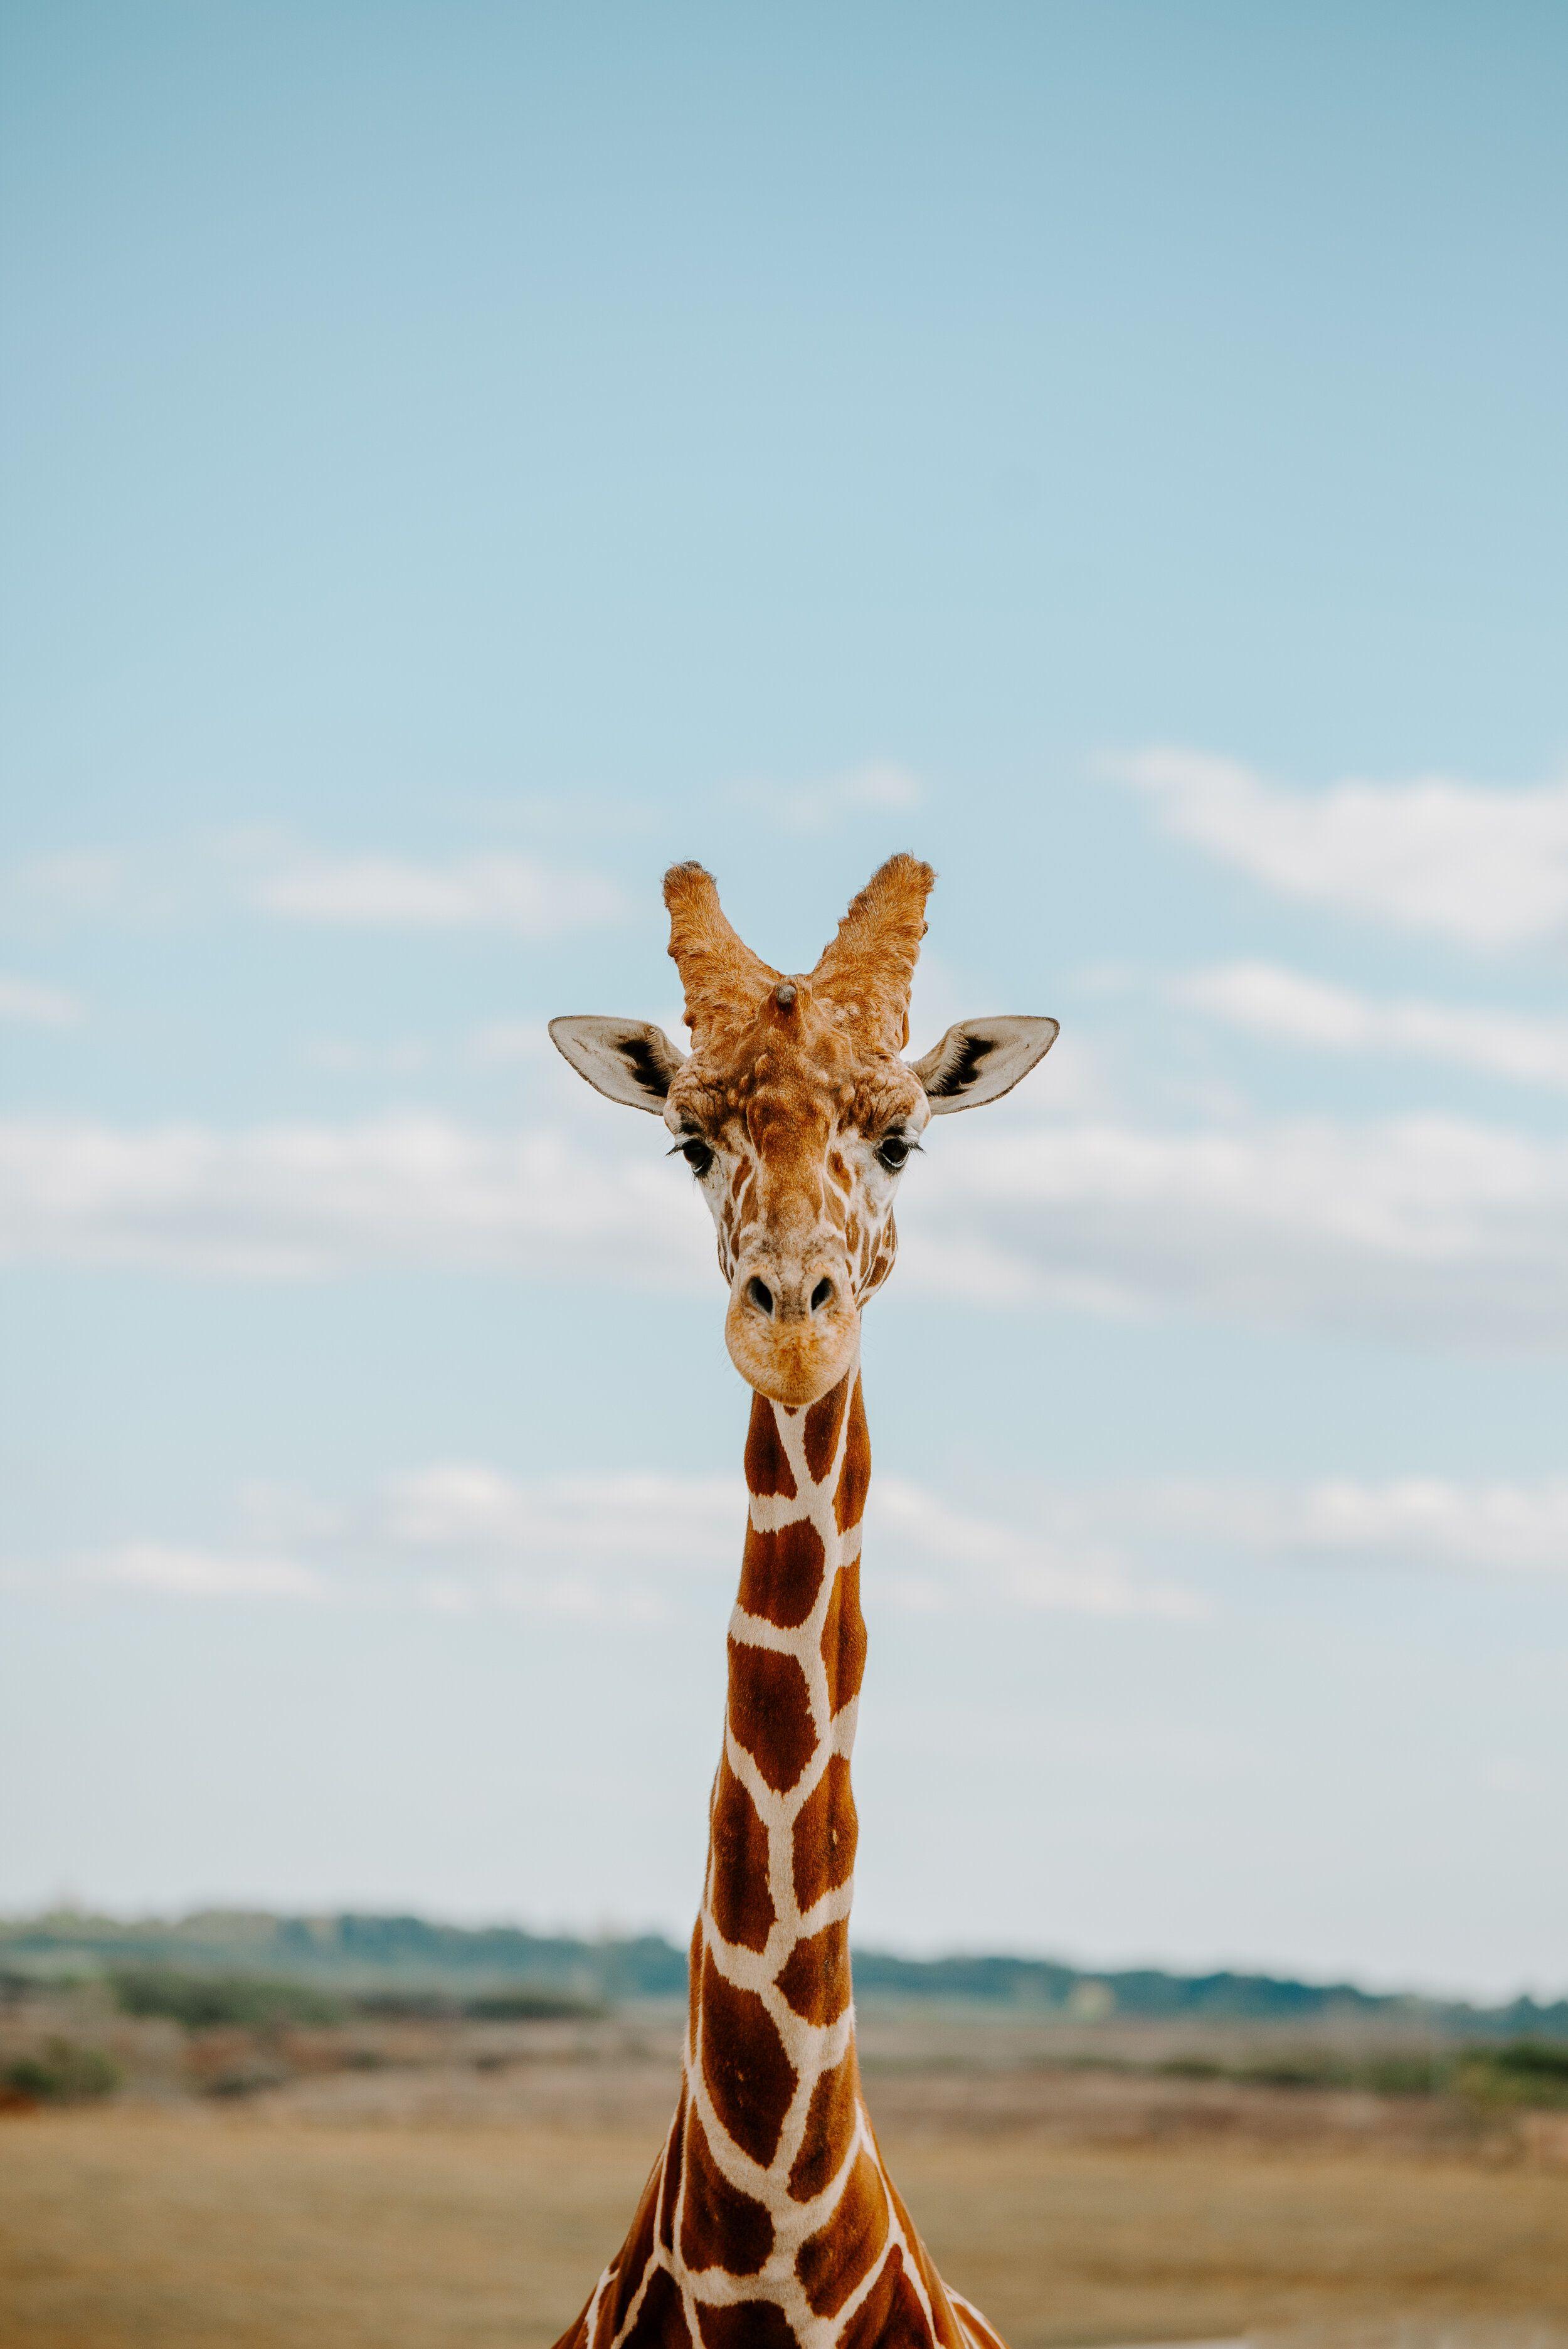 Earthcoco Giraffe 8 Jpg Giraffe Giraffe Pictures Cute Giraffe